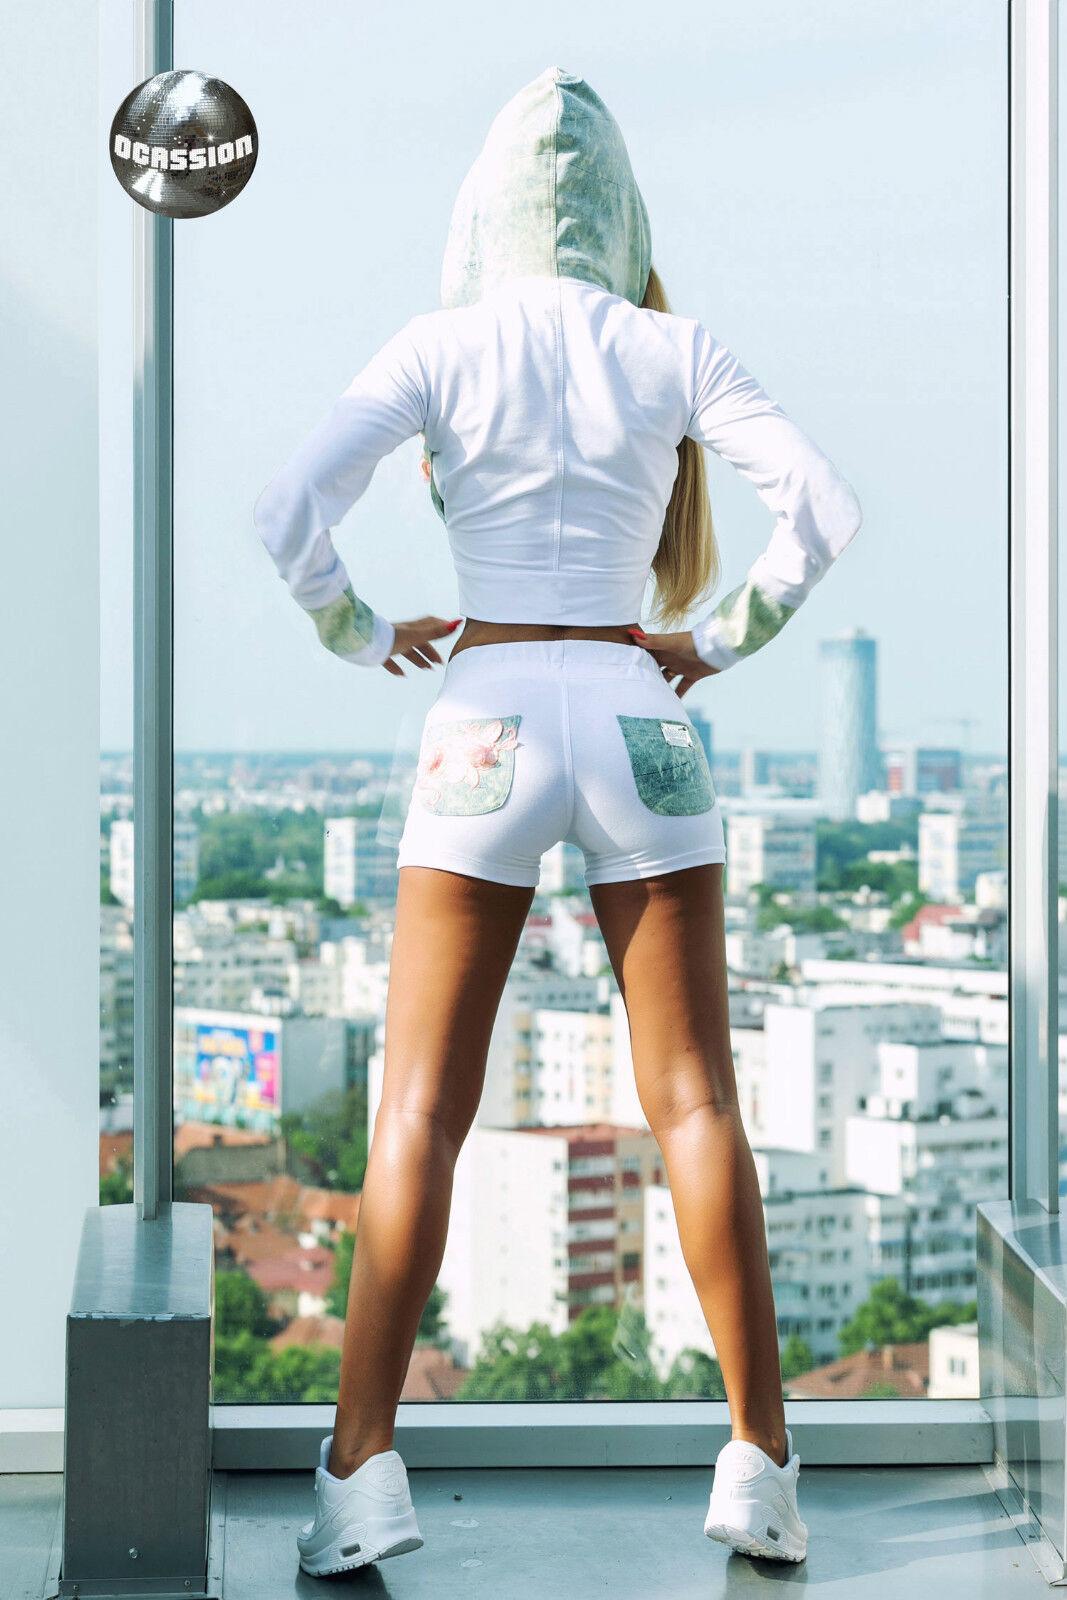 Ocassion 2-Teiler Hoddie Jacke Bauchfrei Hotpants Hotpants Hotpants Fitnessanzug Sportset 32-38 2c7898